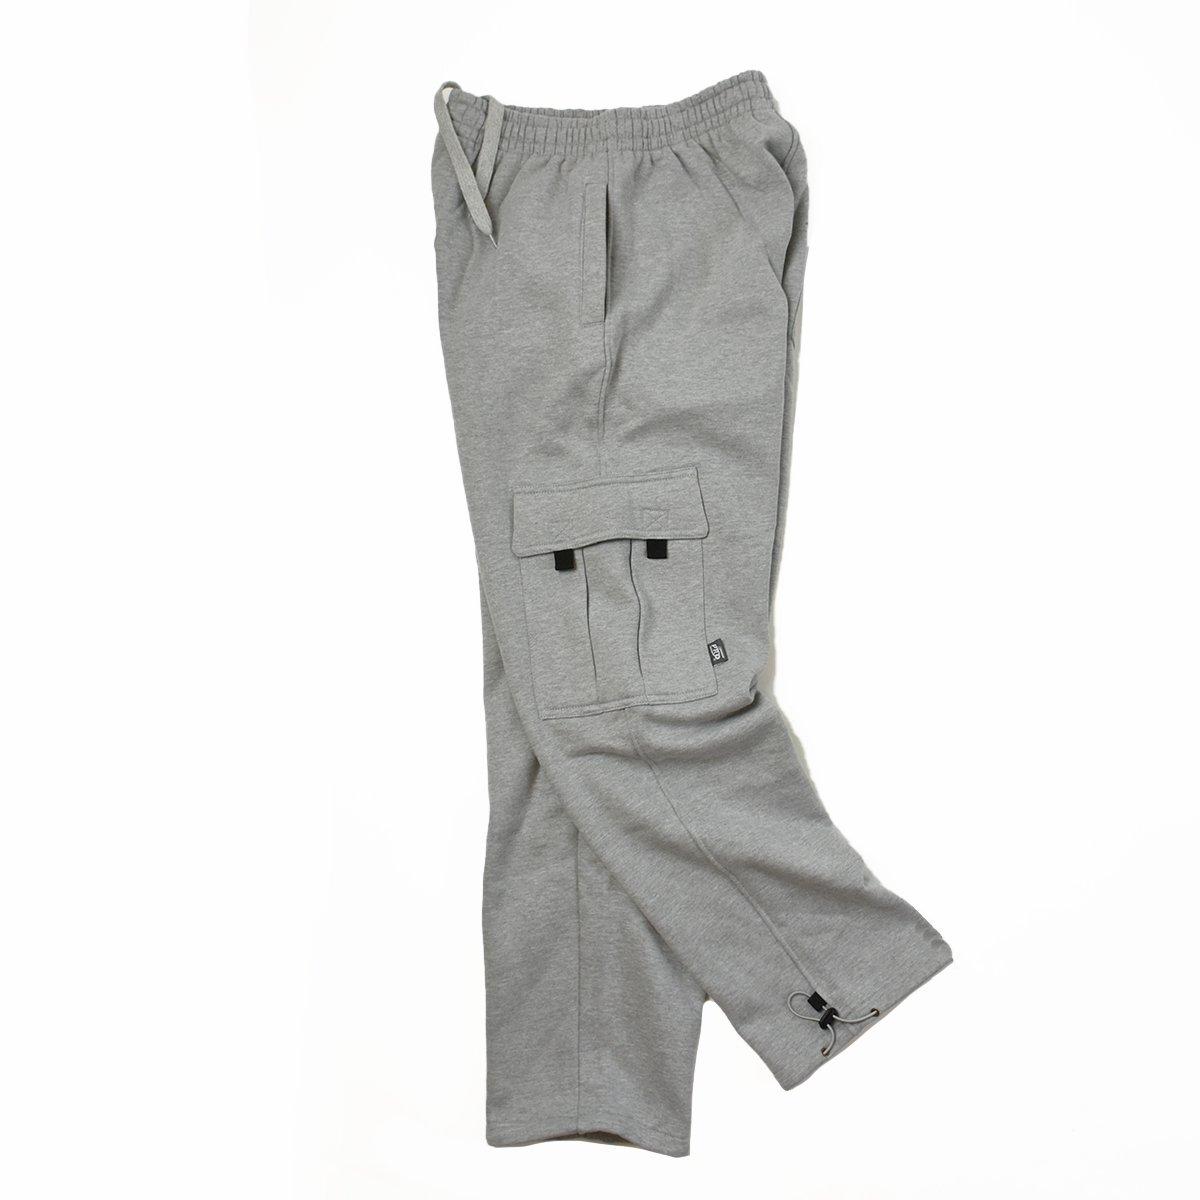 【PRO 5】Heavy Fleece Cargo Pants(Heather Gray)                           </a>             <span class=